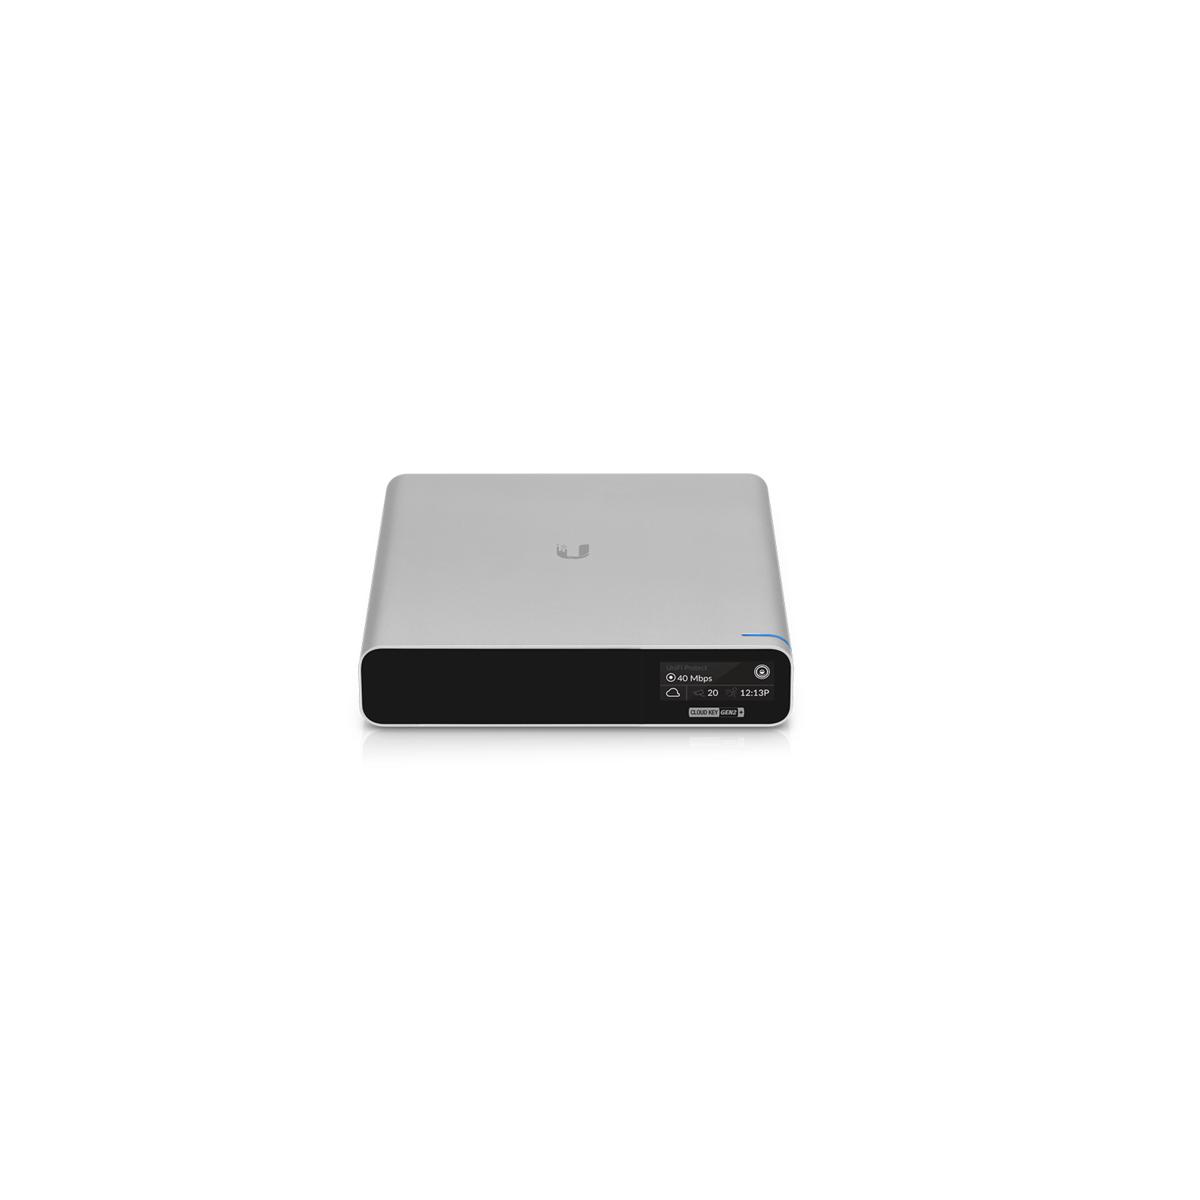 Ubiquiti UniFi Cloud Key GEN 2 PLUS (UCK-G2-PLUS)